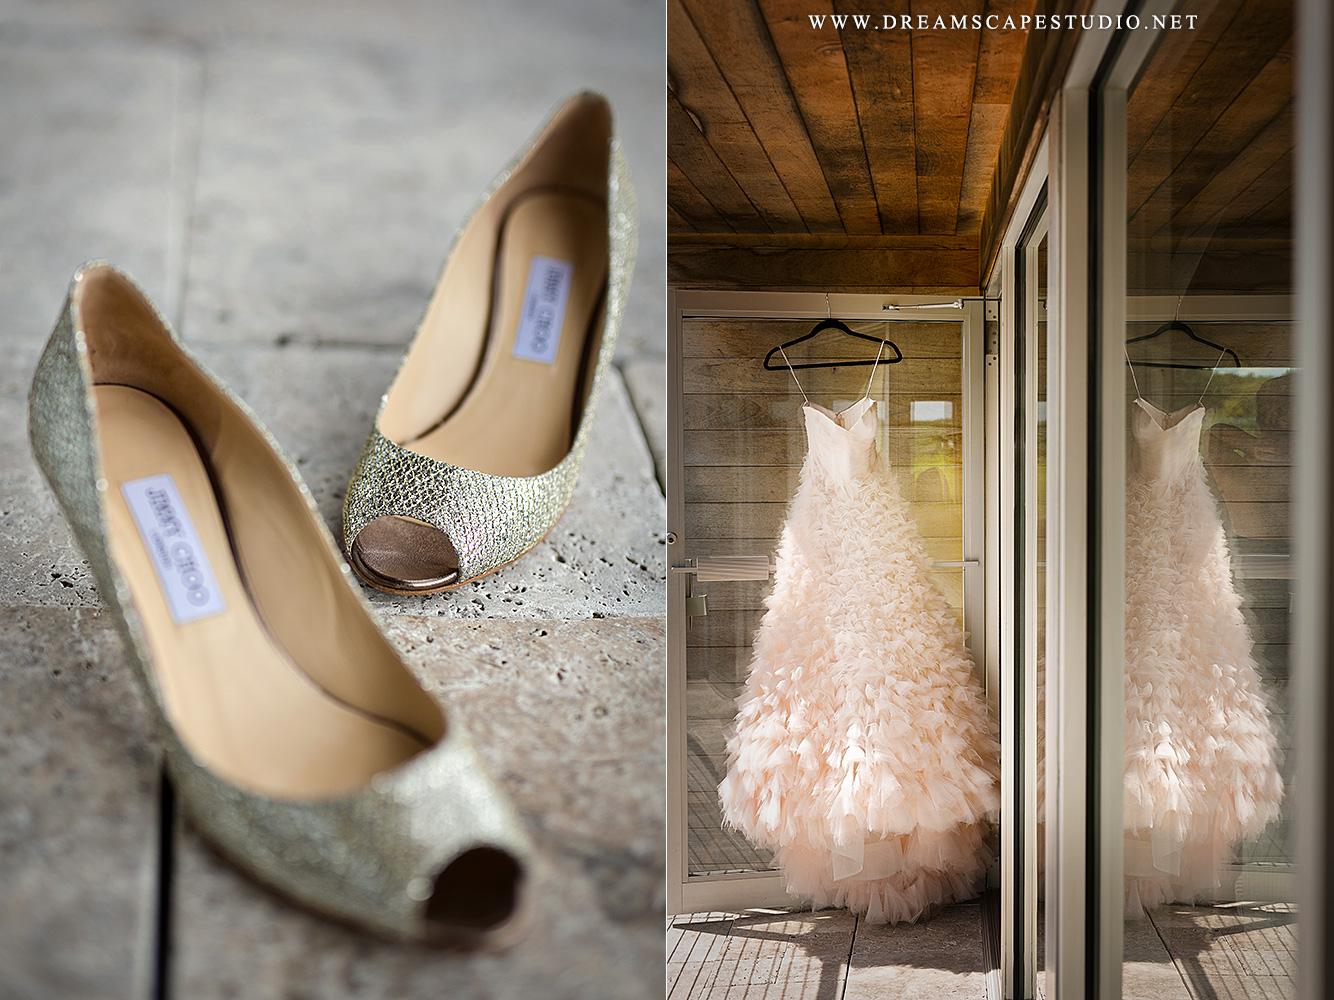 CT_Wedding_Photographer_ZBJi_Blg_01.jpg